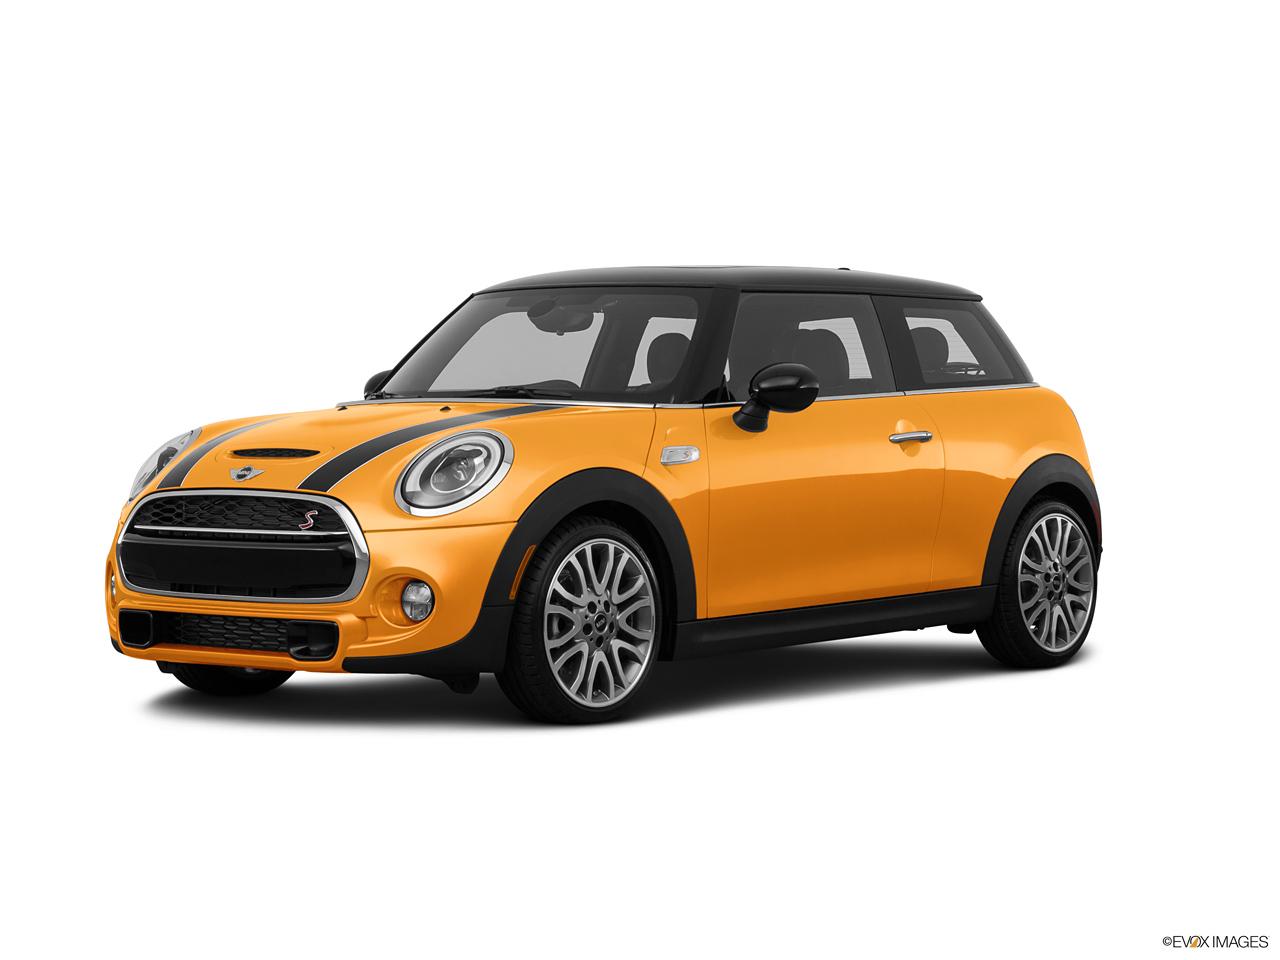 mini hatch 2017 3 door cooper s in qatar new car prices specs reviews photos yallamotor. Black Bedroom Furniture Sets. Home Design Ideas